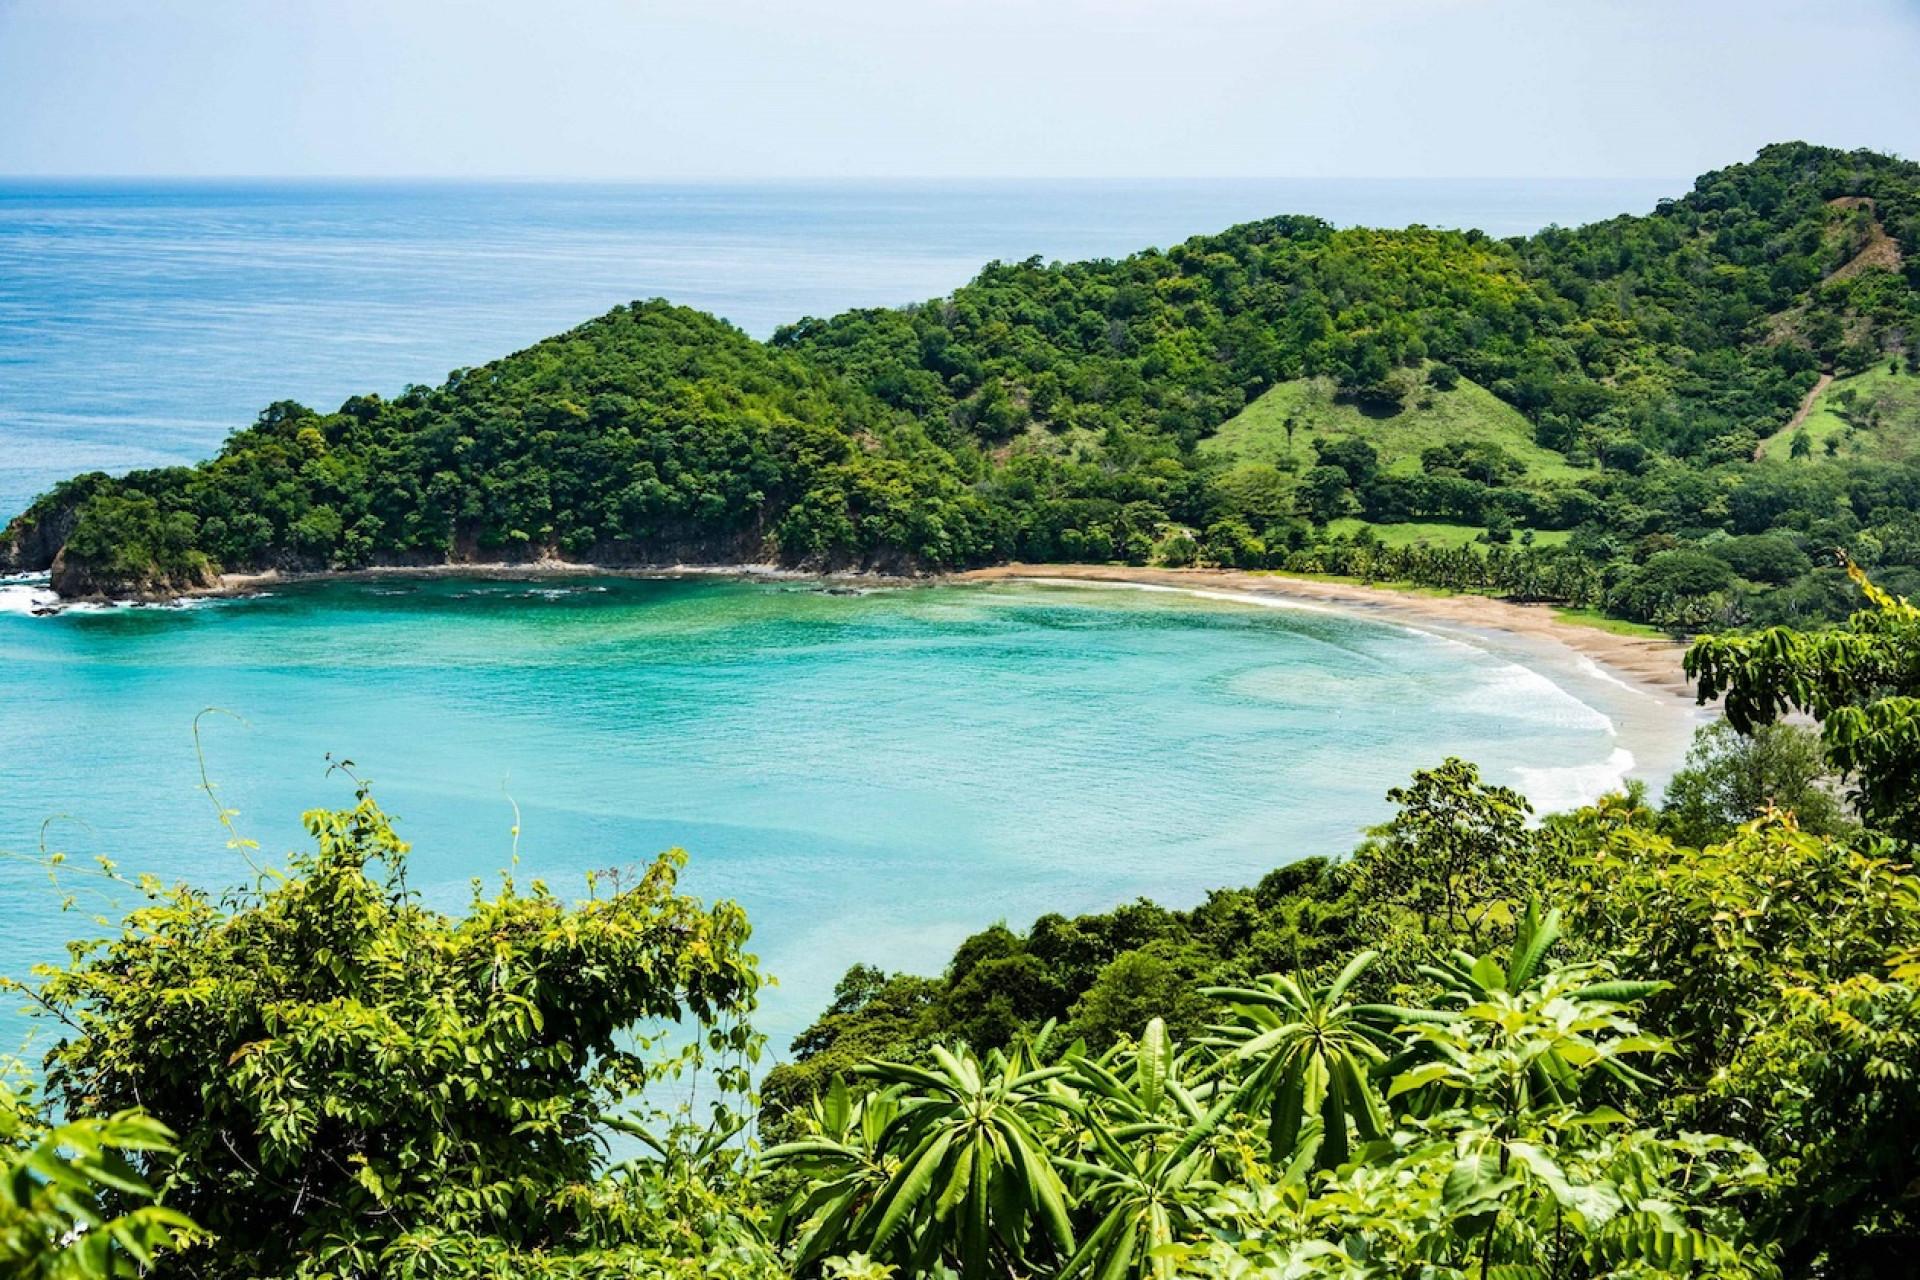 Charter Destination: Central America